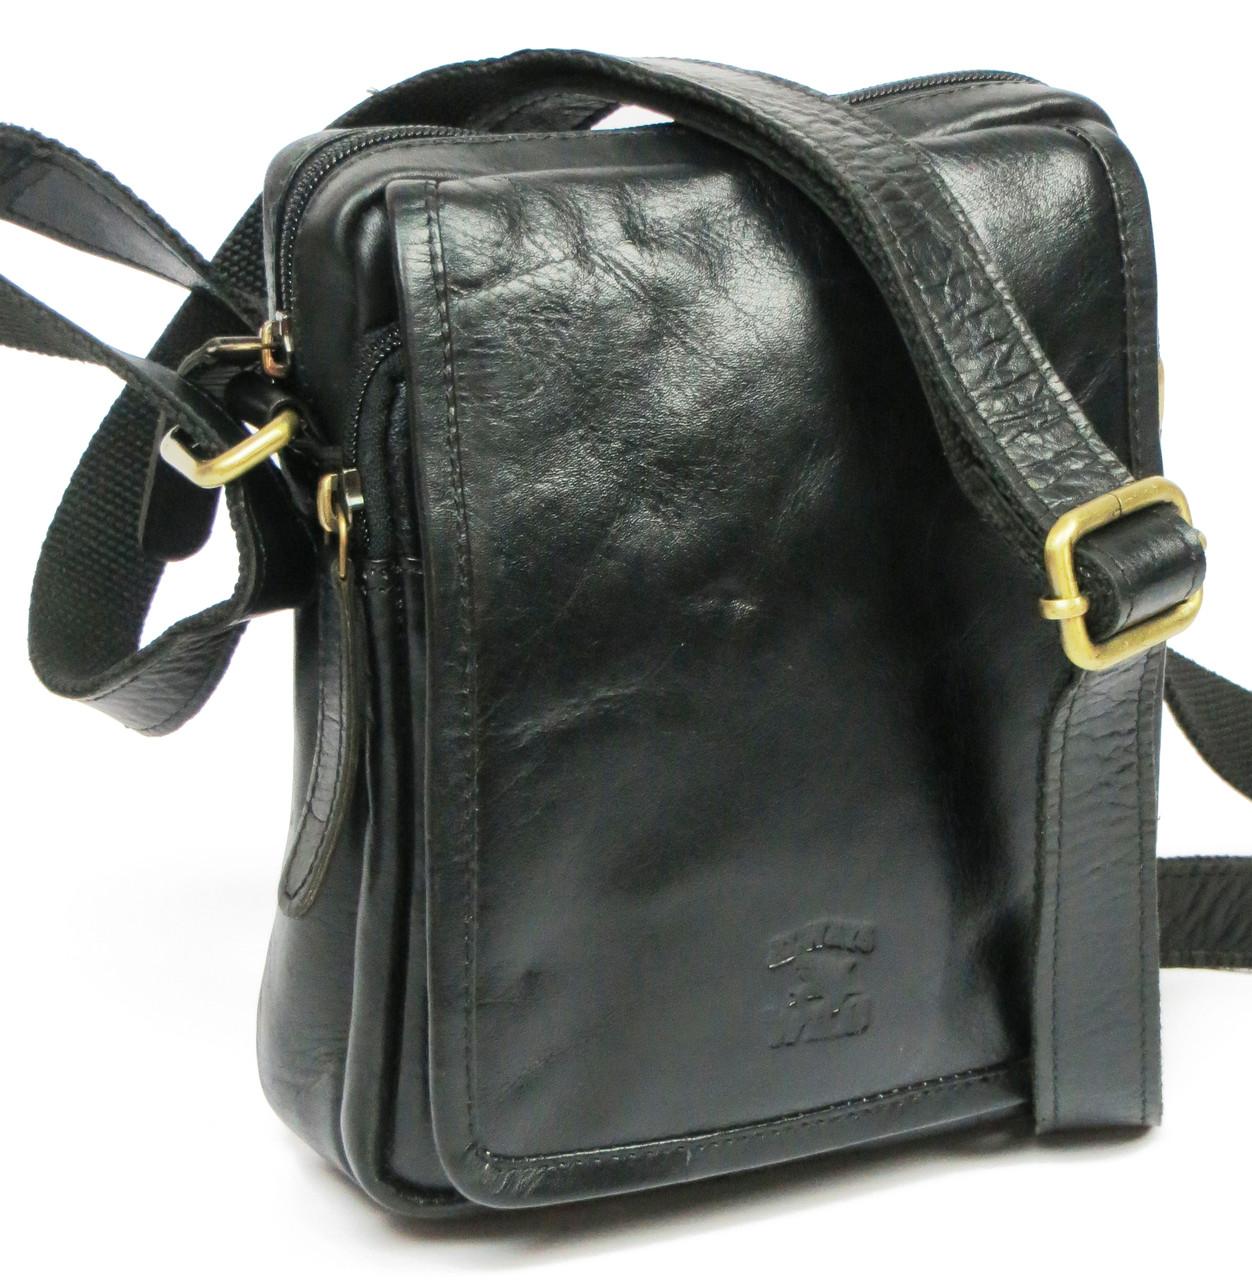 Мужская кожаная сумка Always Wild 5031 черная